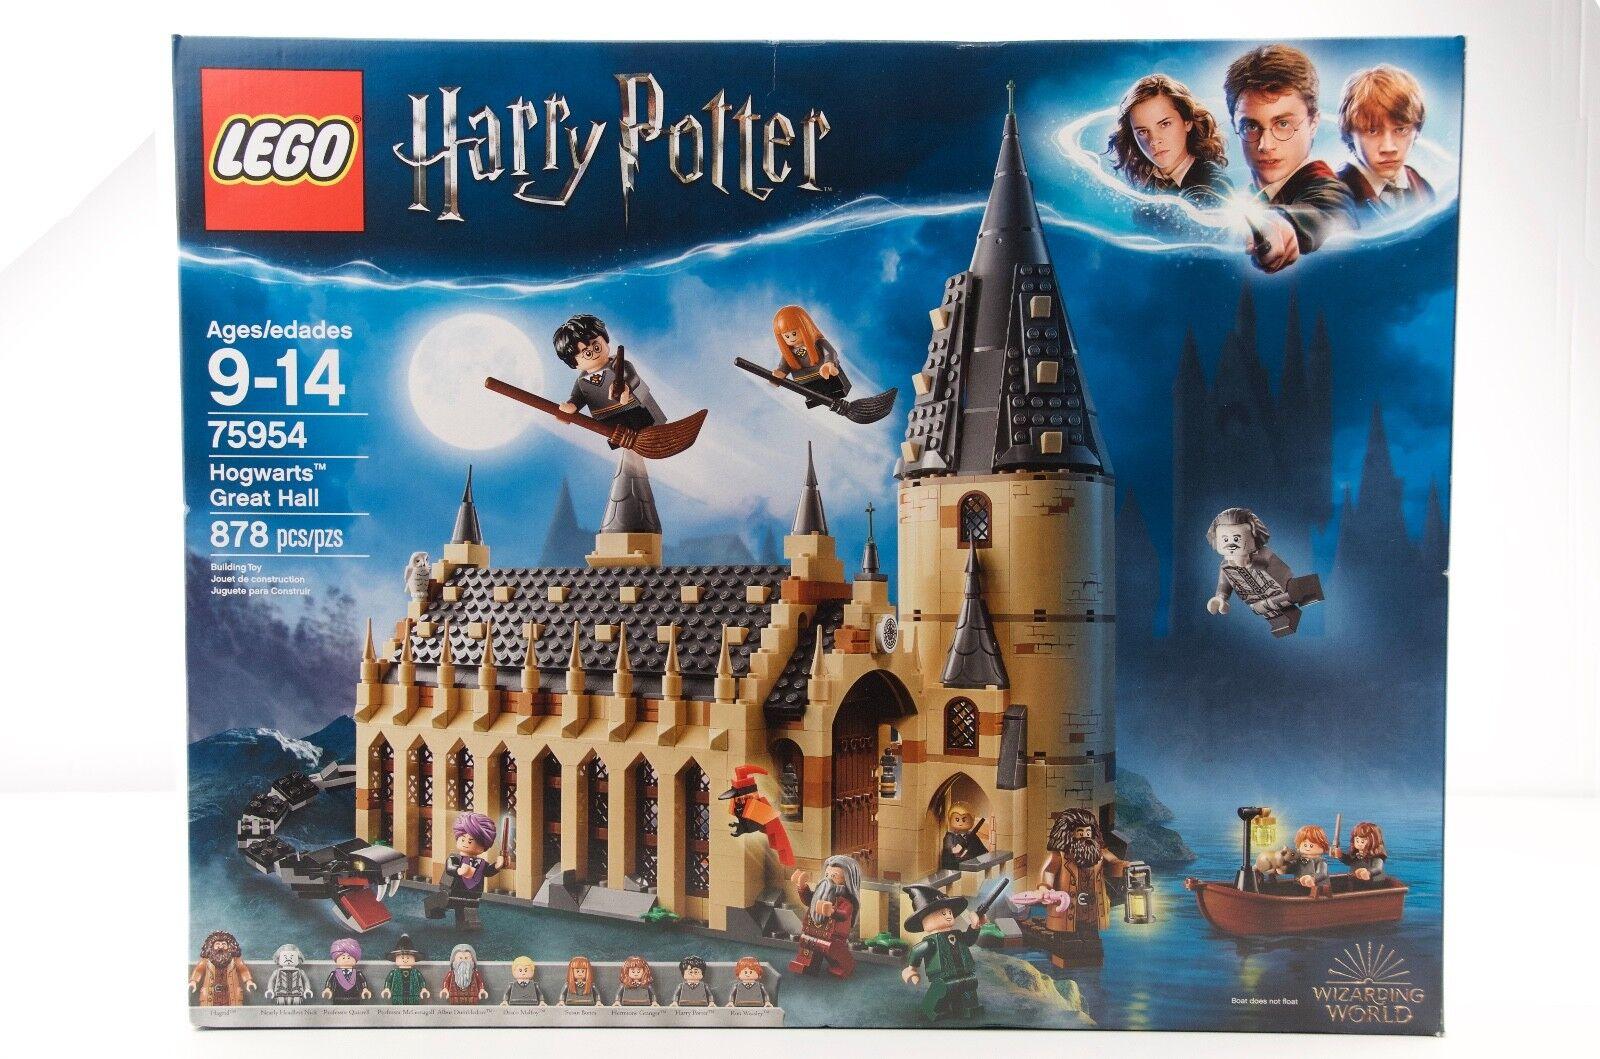 Lego, HARRY POTTER, 75954, Hogwarts Great Hall, 878 PCS, Ages 9 & Up, NIB